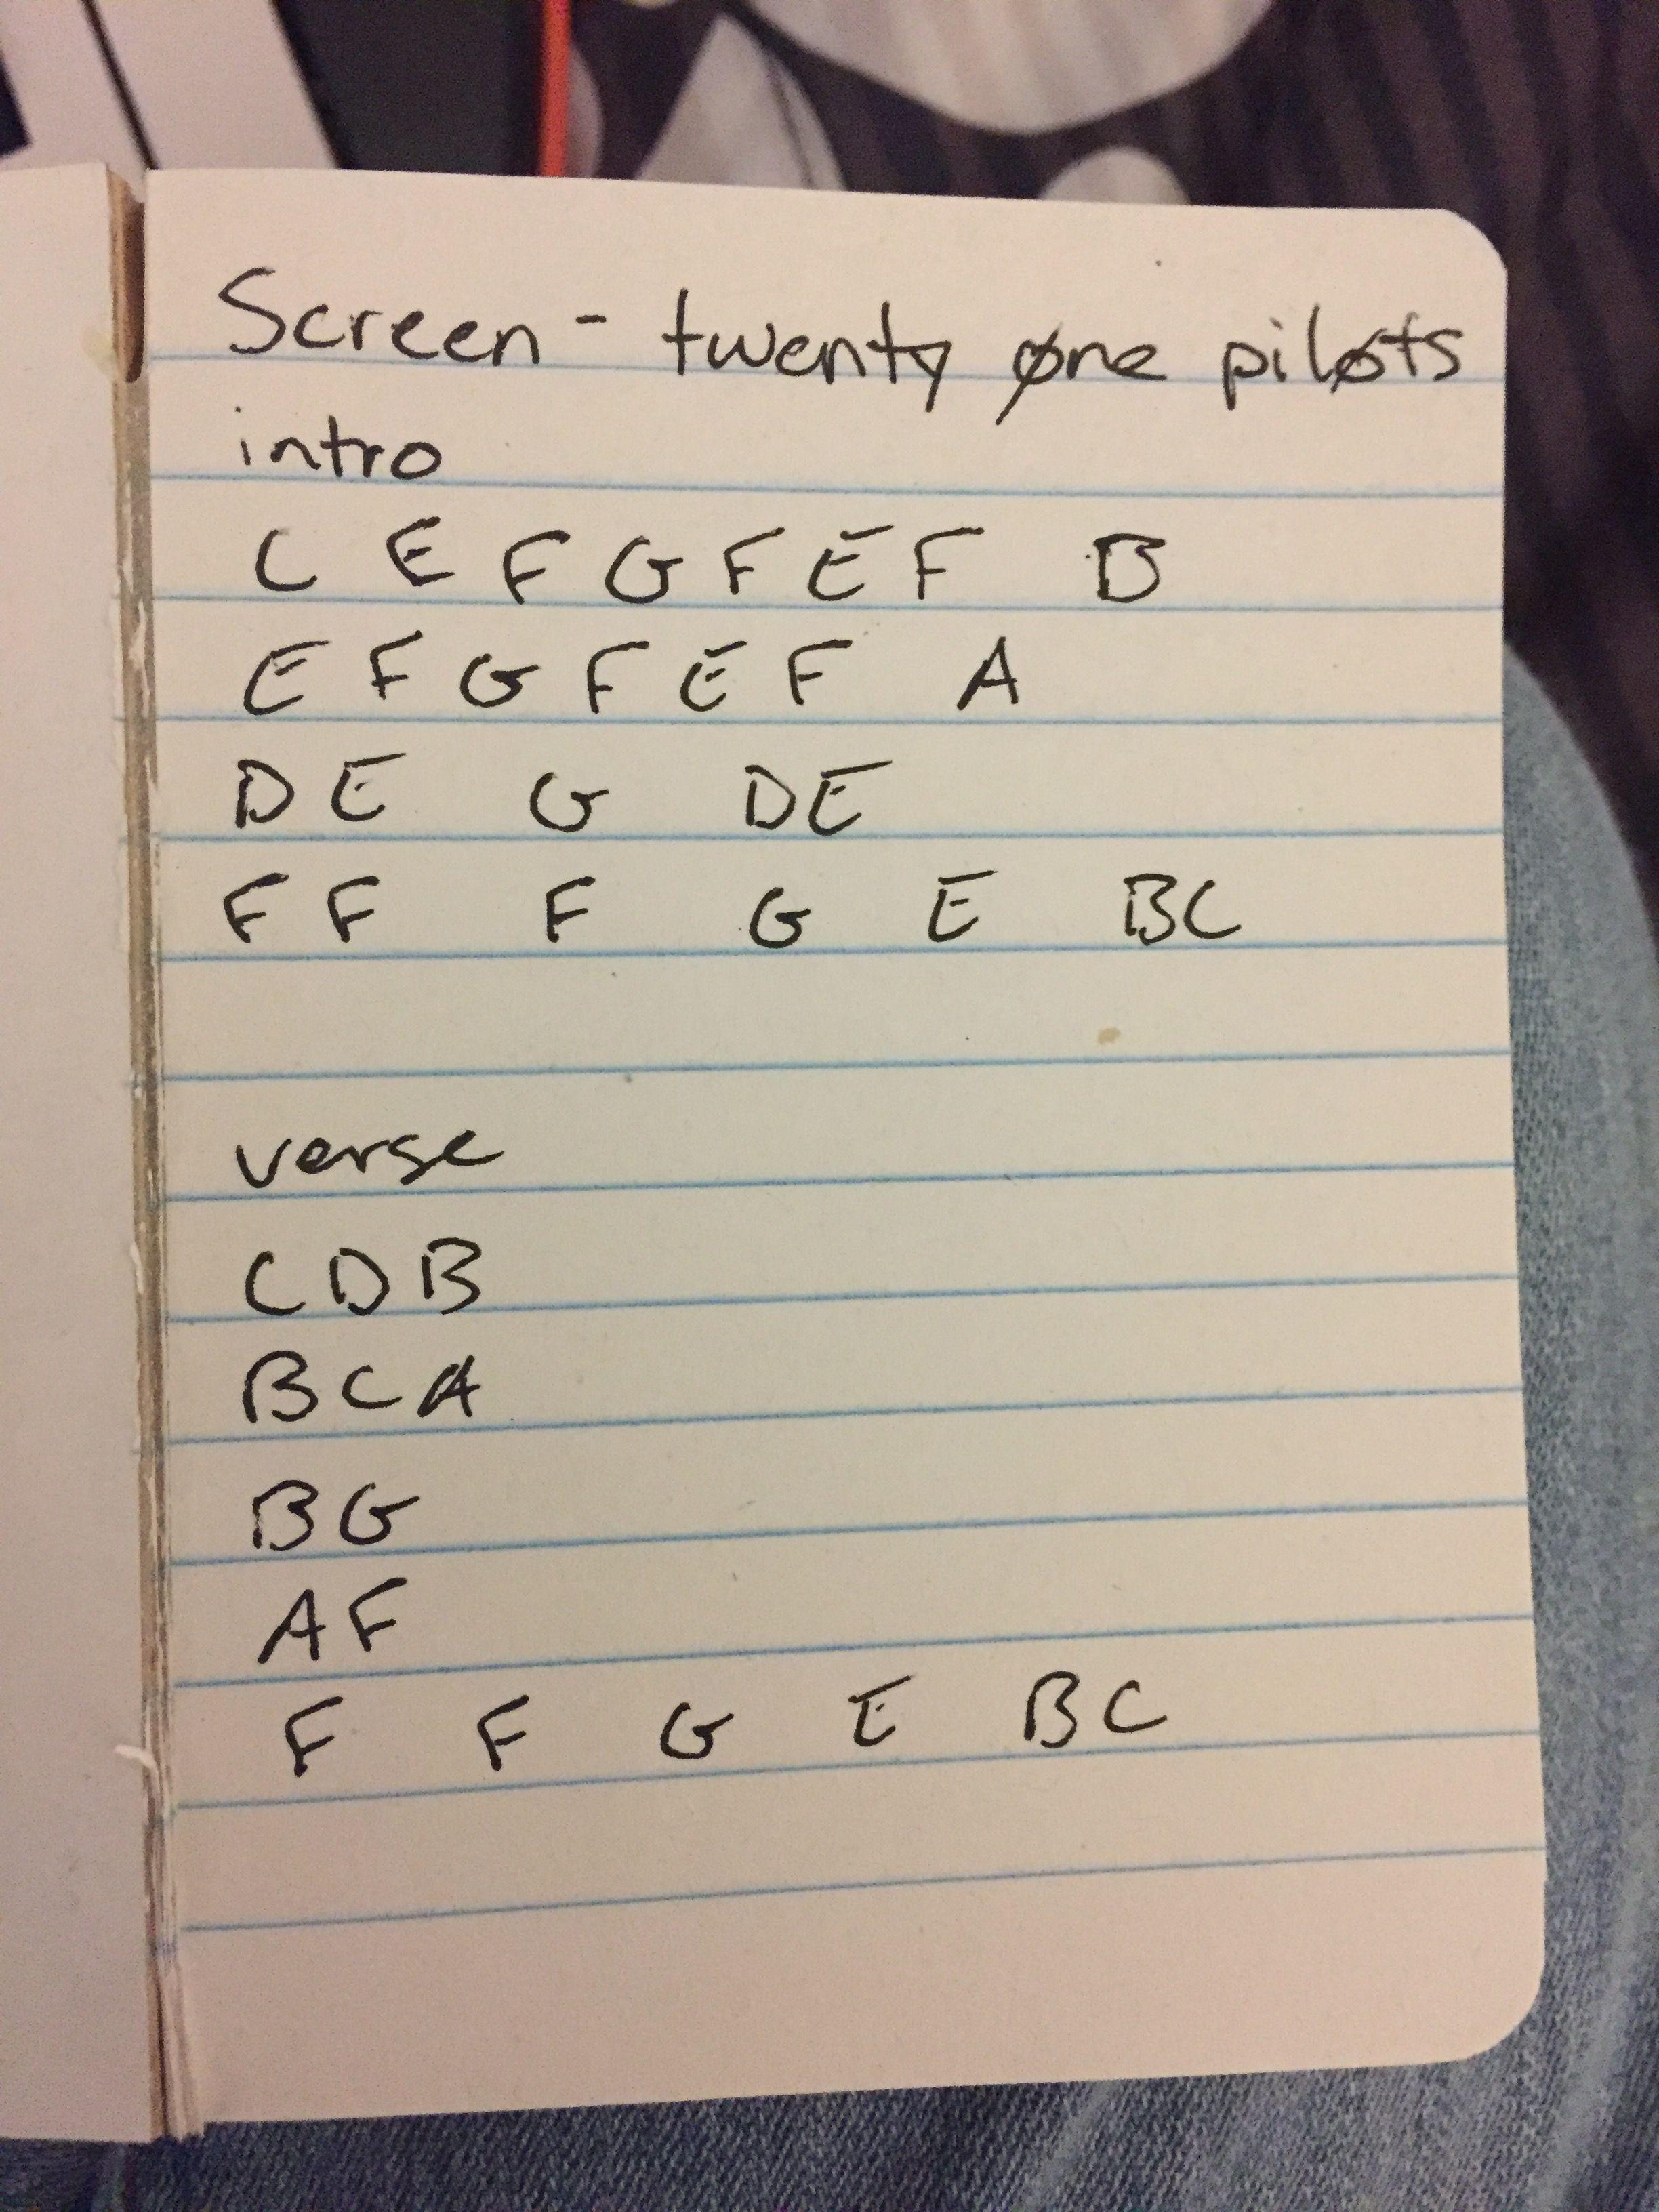 Twenty one pilots Screen piano keys because I can t read sheet